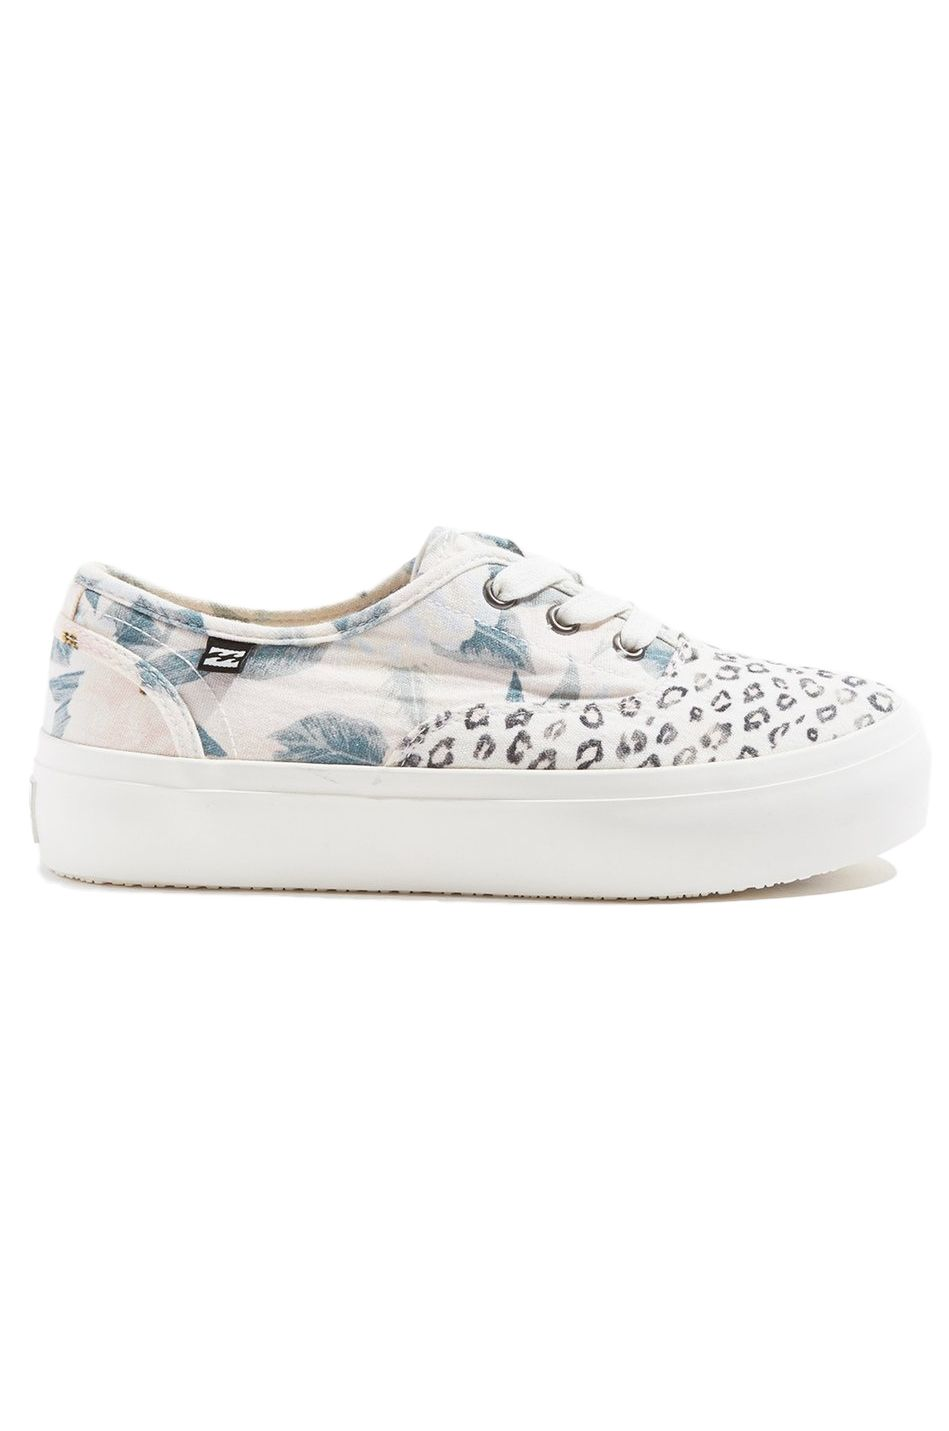 Billabong Shoes SWEET SUMMER SALTY BLONDE Multi